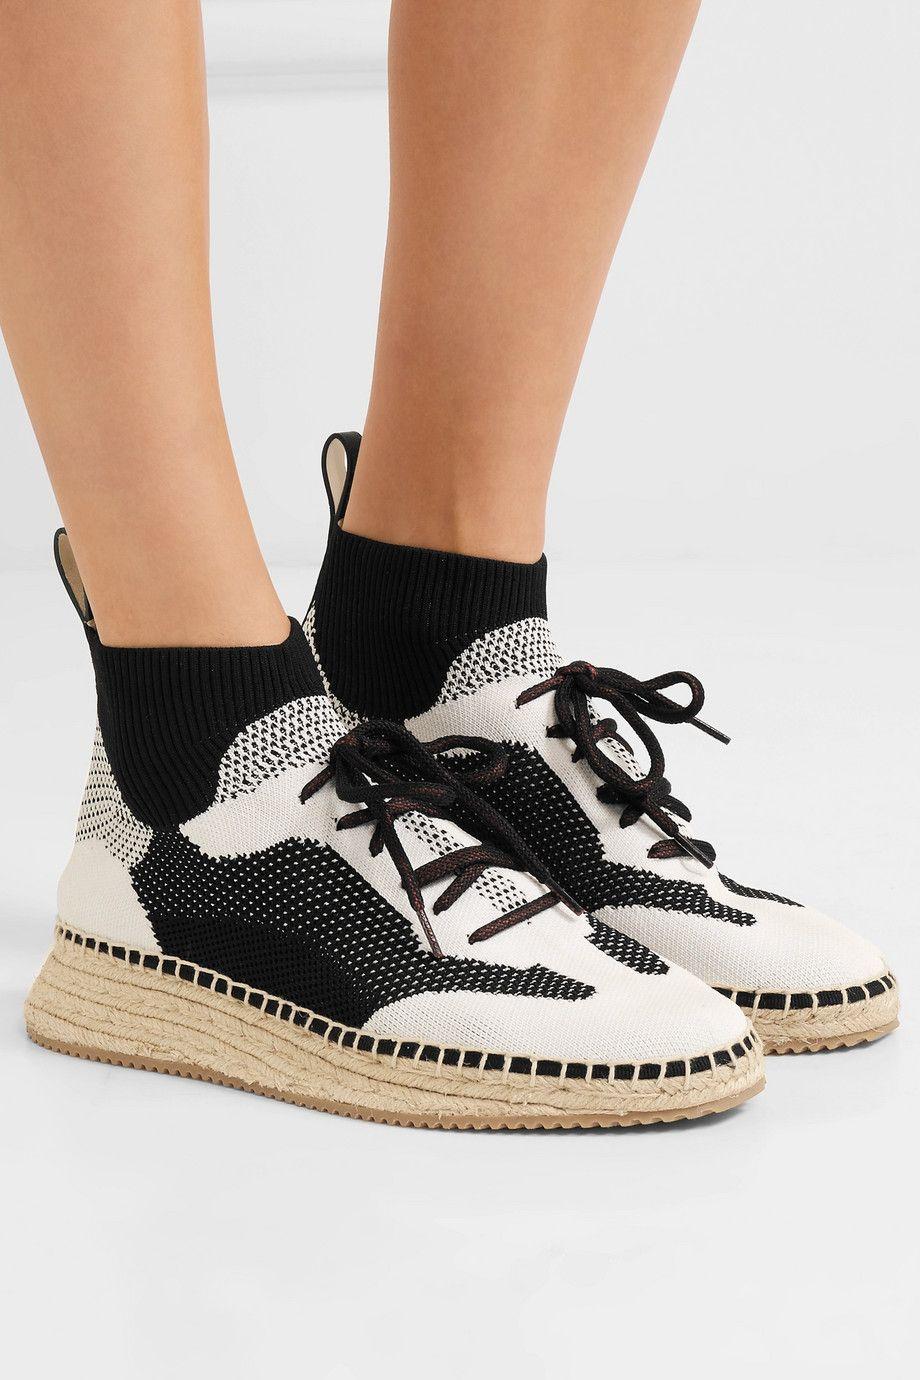 cheap sale looking for Alexander Wang Dakota Knit Espadrille Sneakers 100% authentic cheap online huge surprise sale online outlet fashion Style best seller for sale 1fFVkut1n